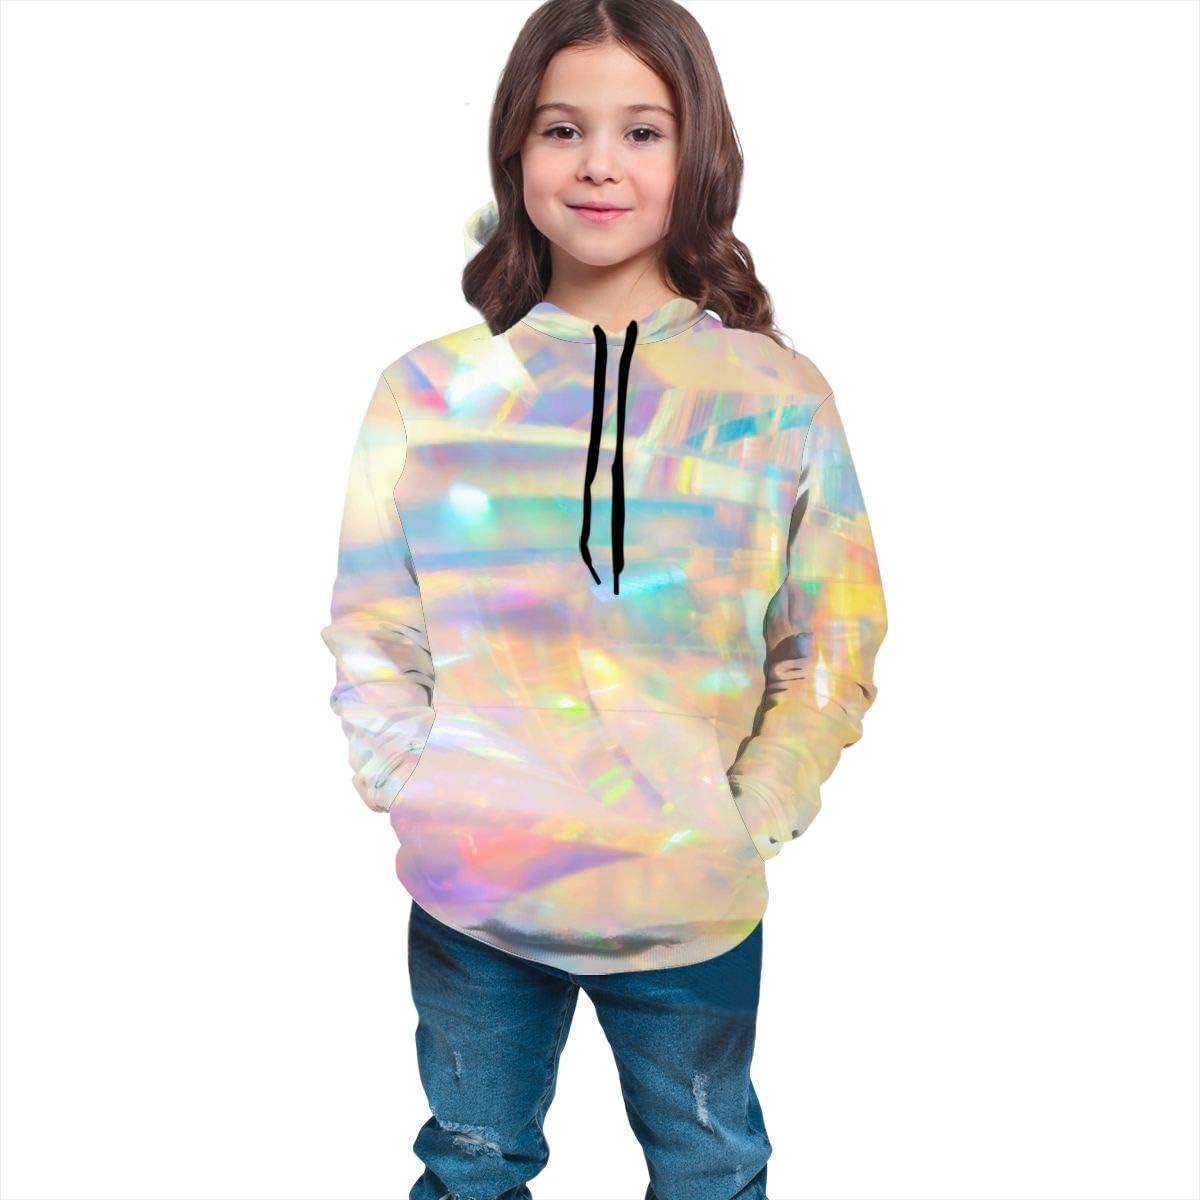 Lichenran Holographic Iridescent Metallic Men 3D Print Pullover Hoodie Sweatshirt with Front Pocket